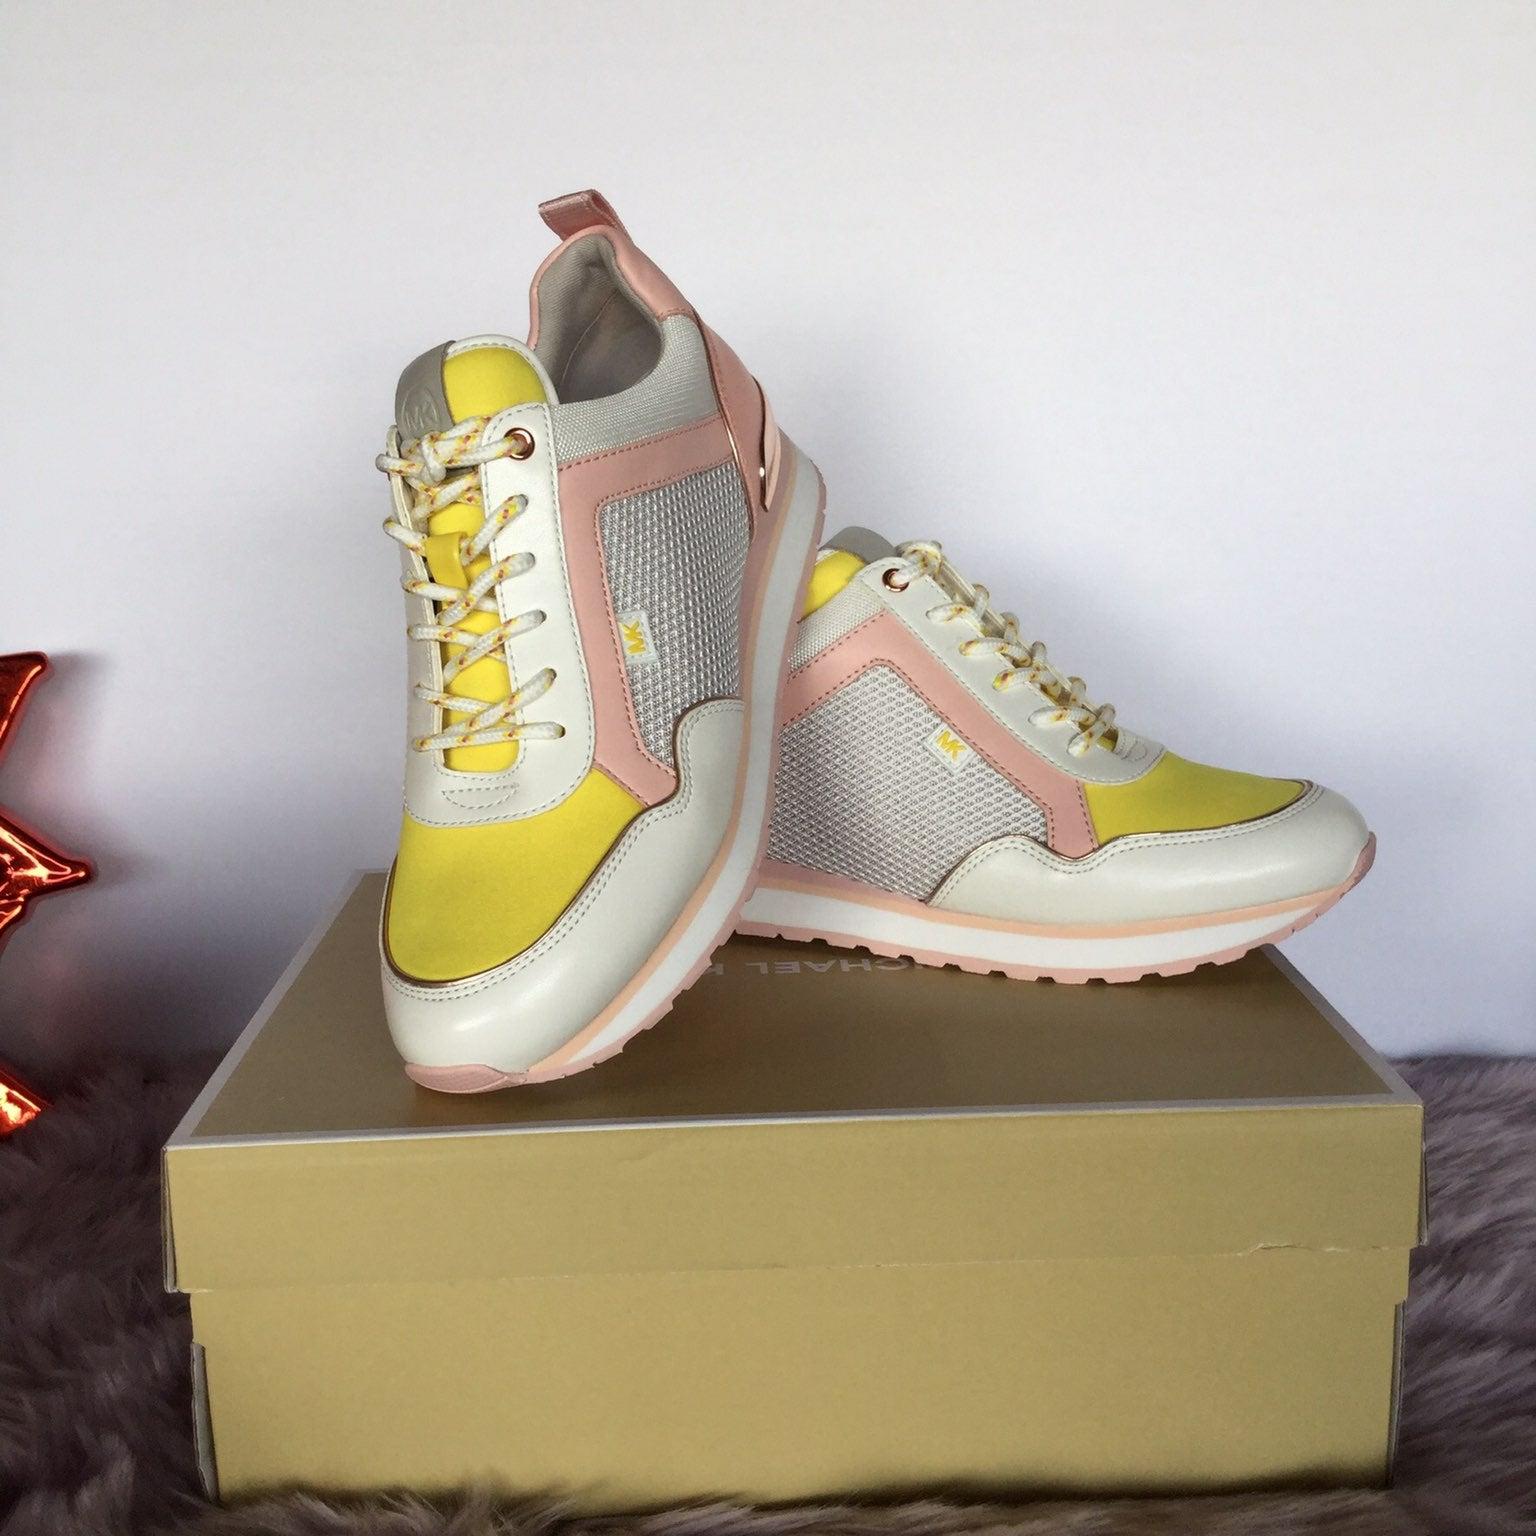 NWT Michael Kors 8.5 W Sneakers